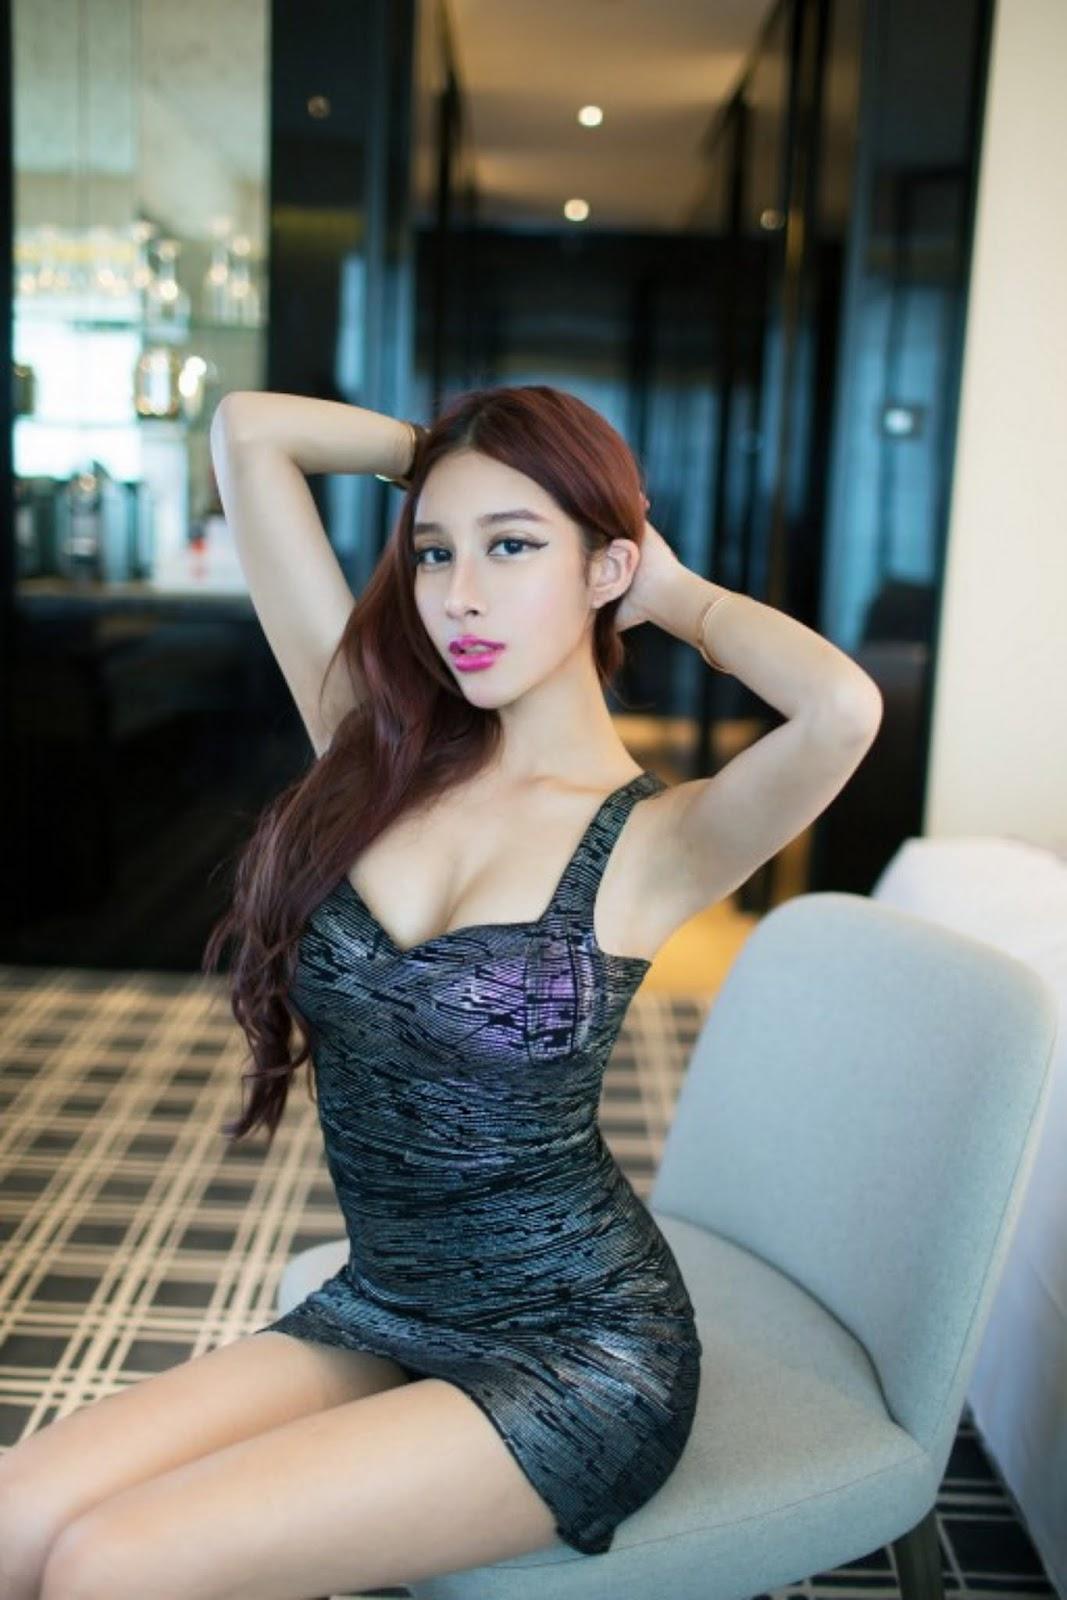 %25C2%25B1 %25C2%25B1 03 - Model Nude TUIGIRL NO.49 Beauty Body Tits